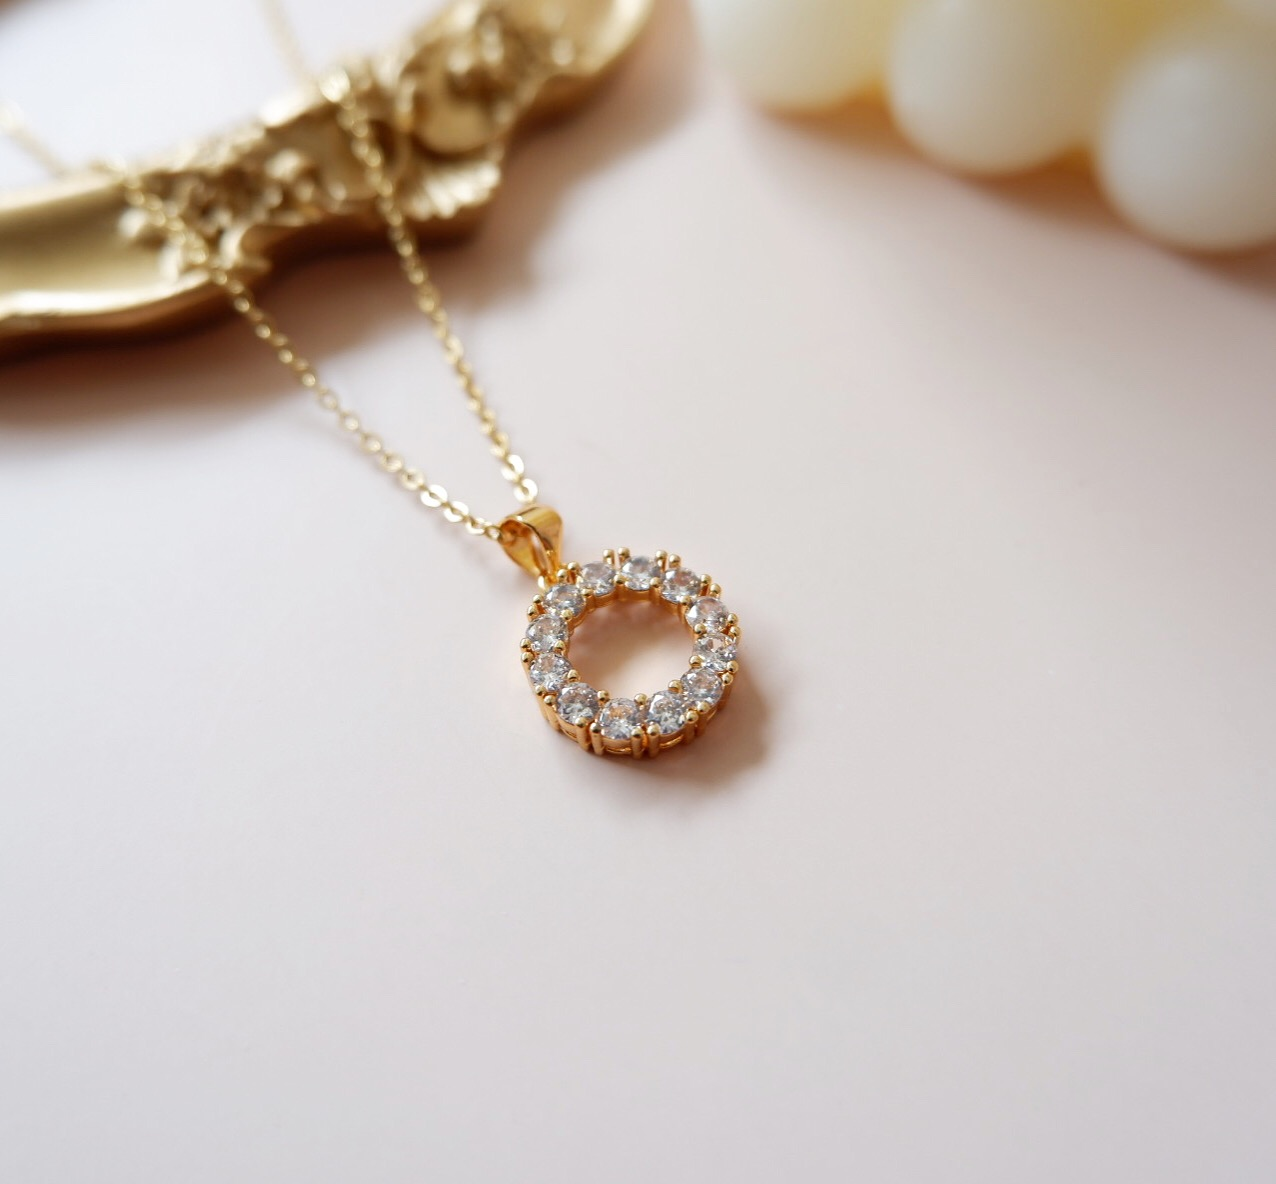 Bianca-Necklace-1.jpeg